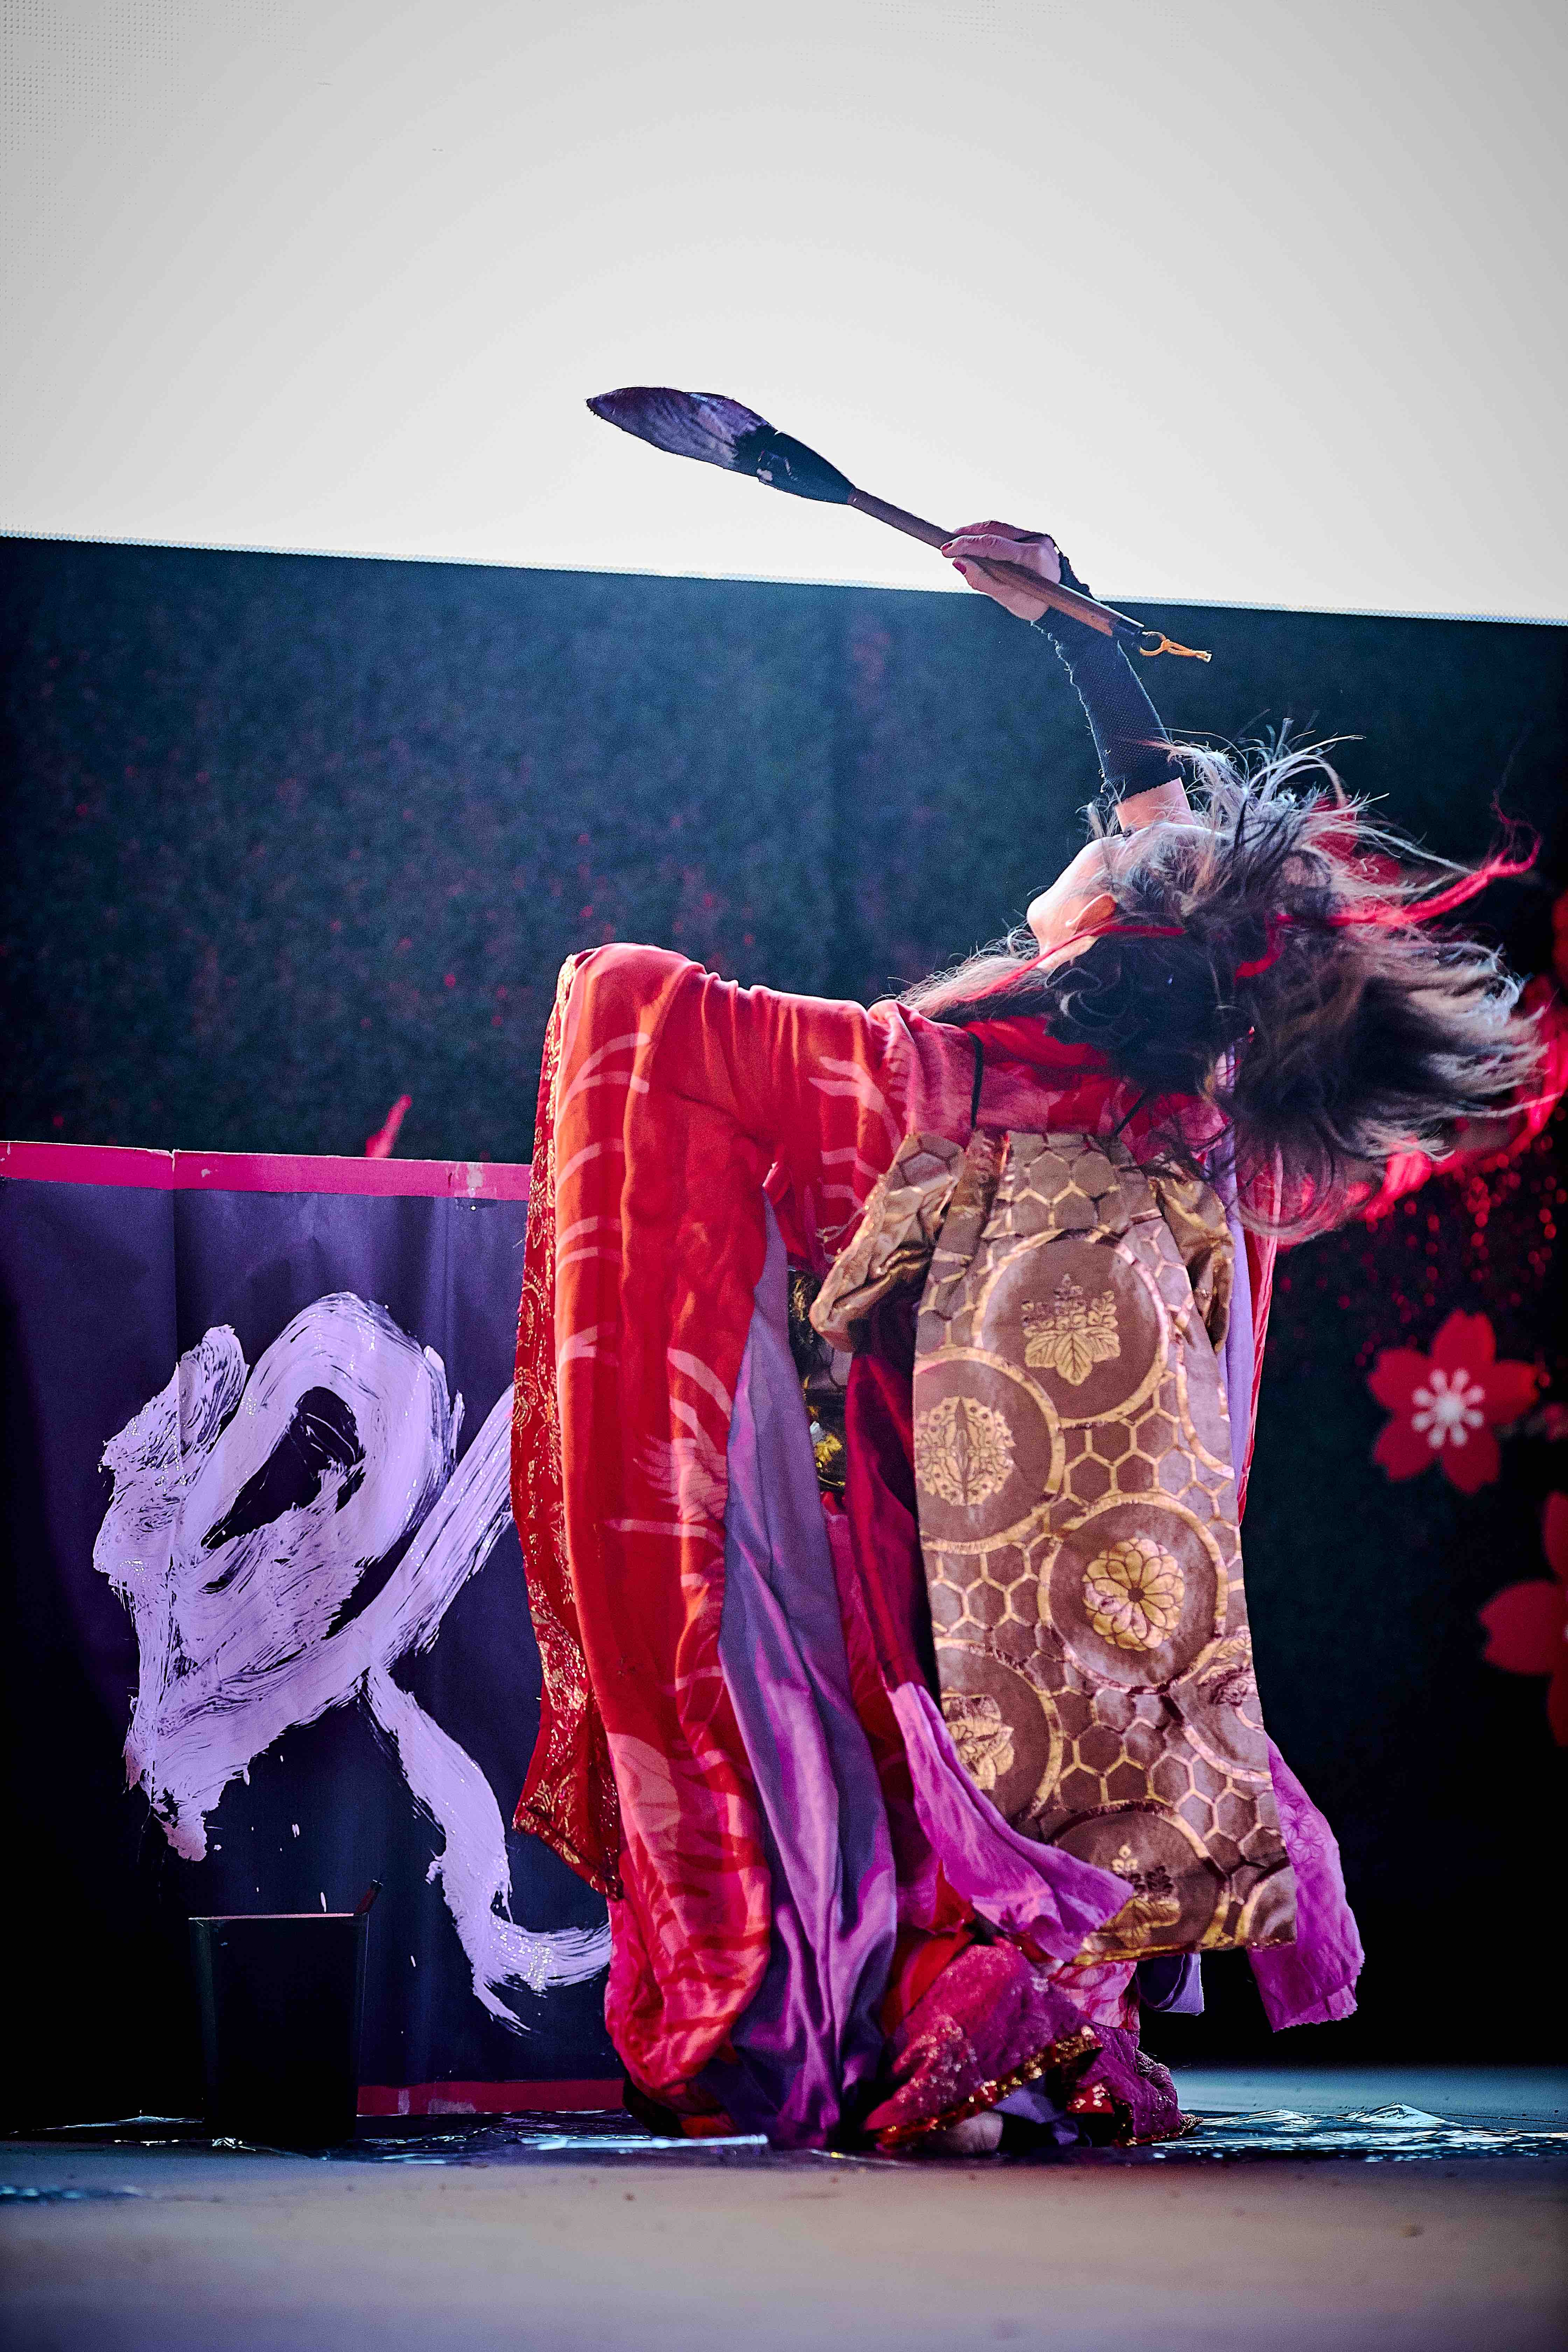 Miyuki GETA DANCE ART OCcbfest calligrap